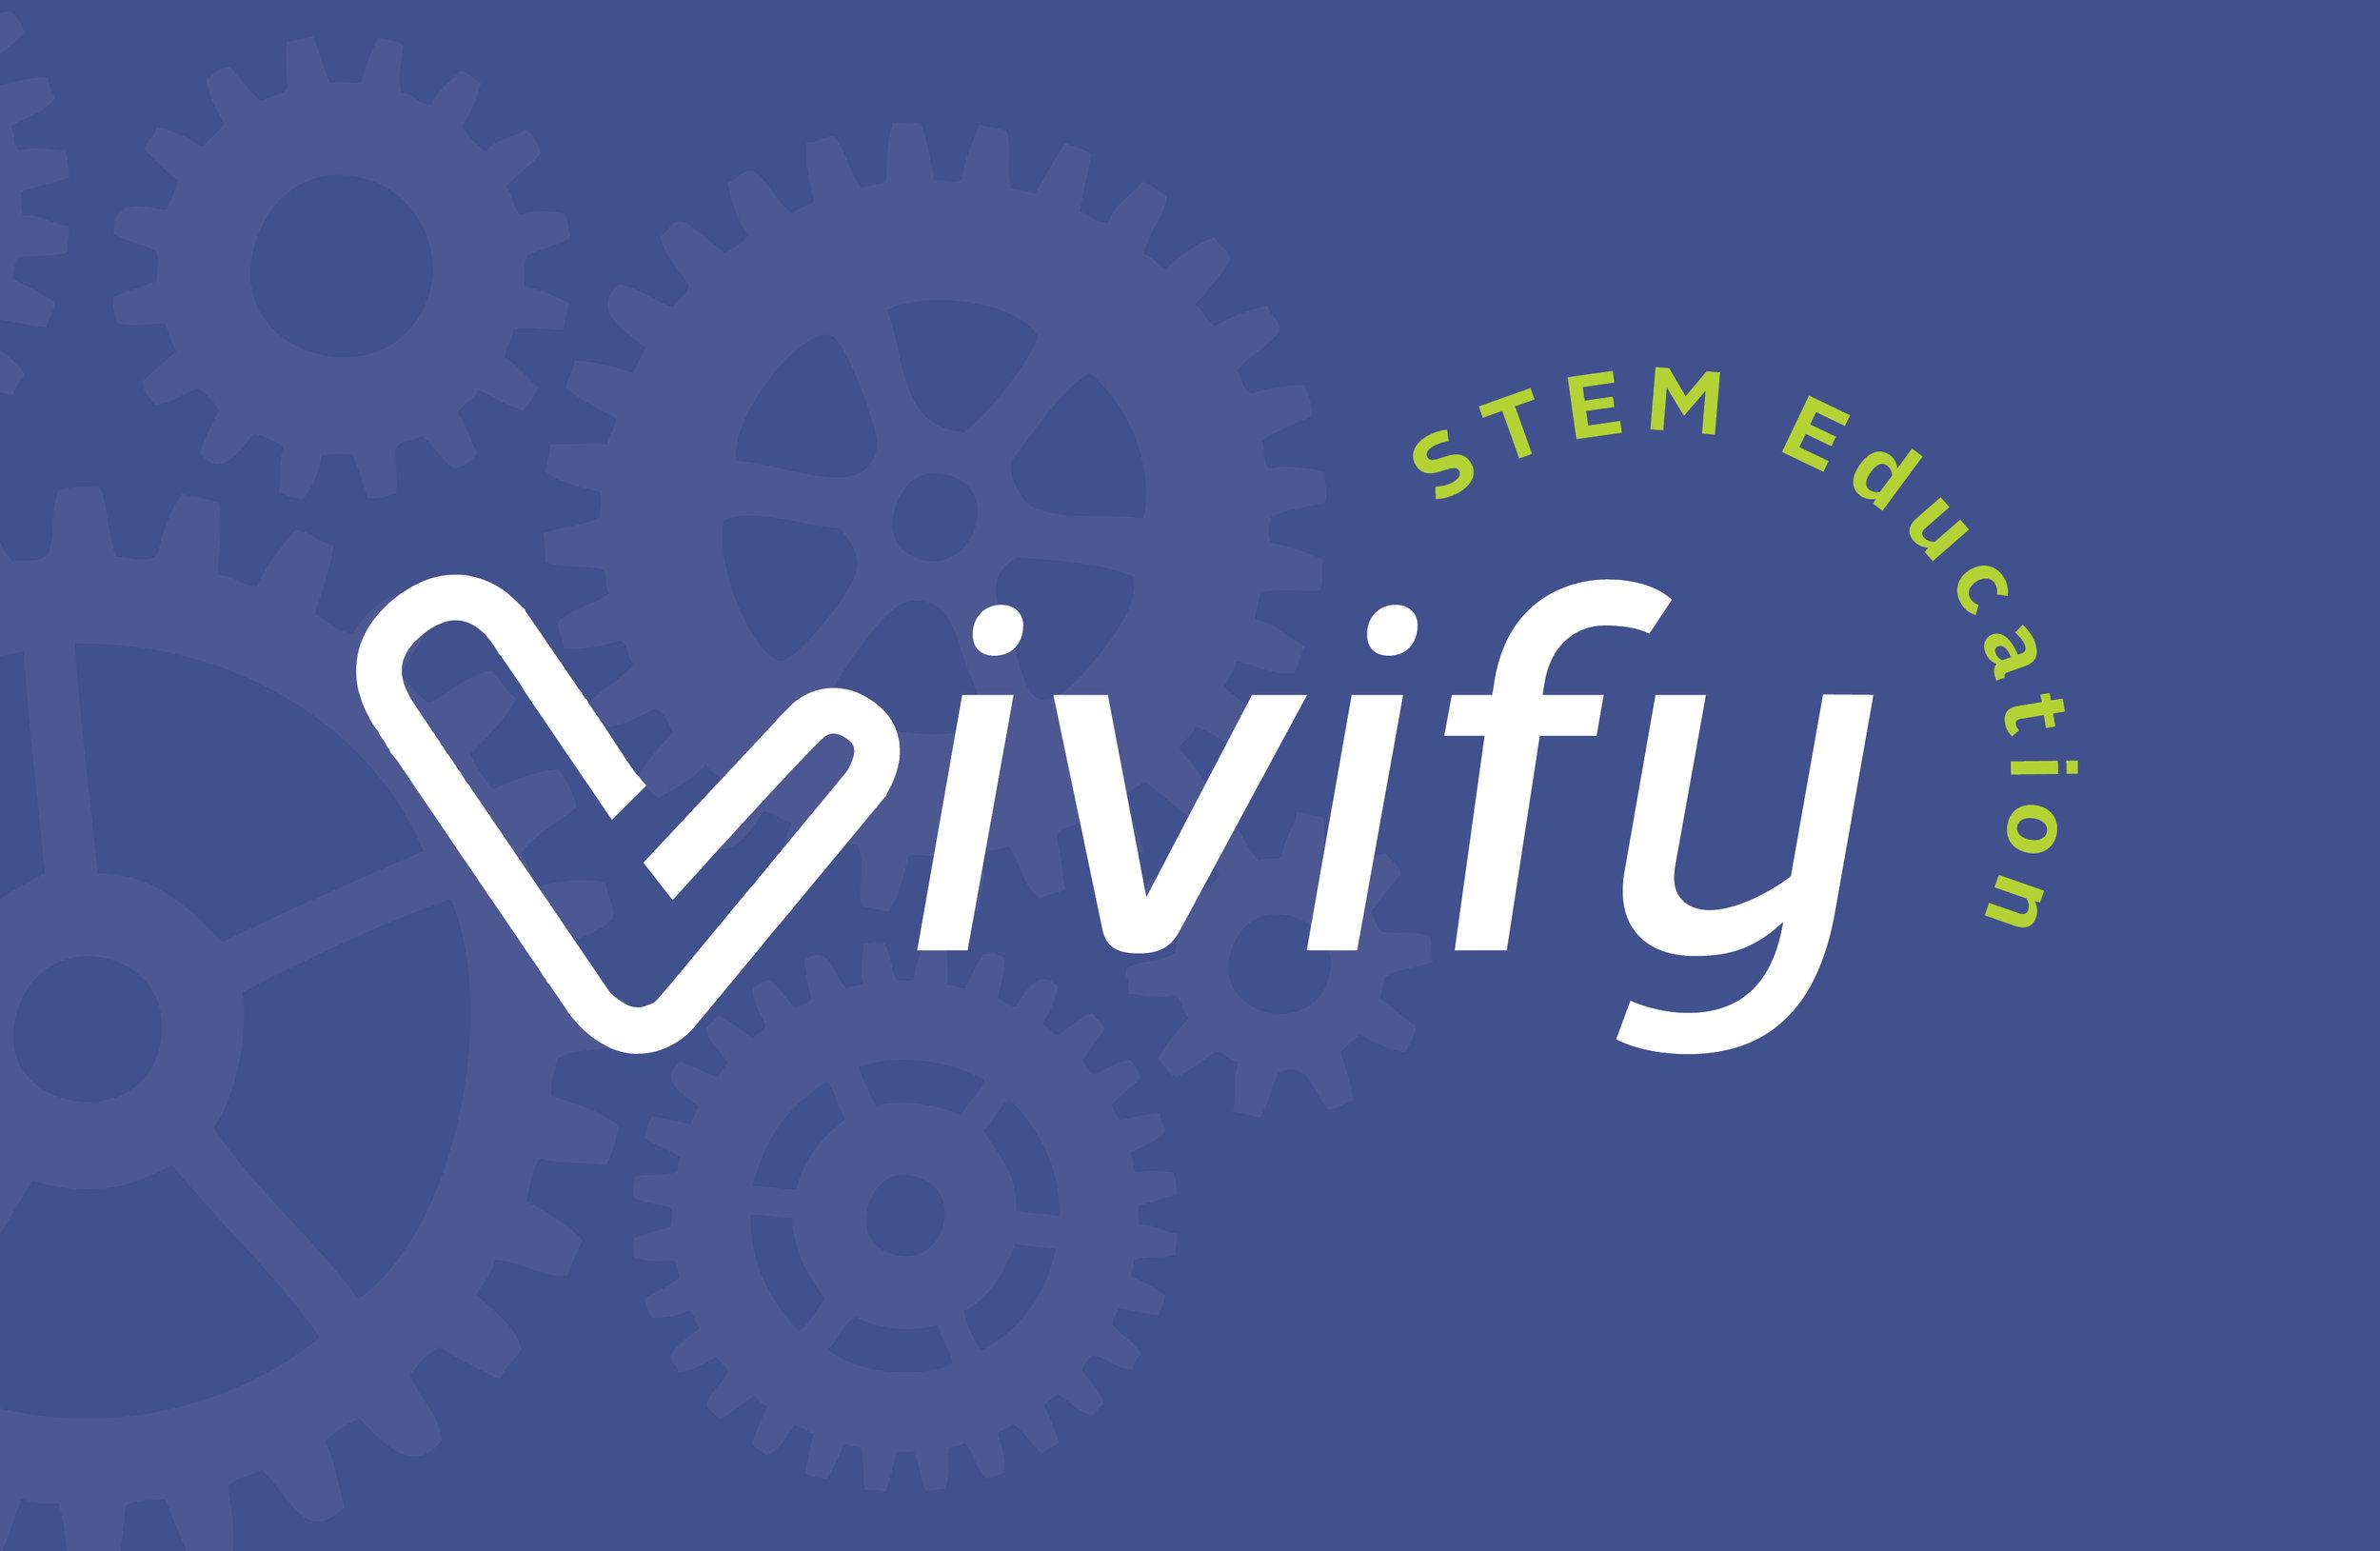 Vivify STEM Education logo